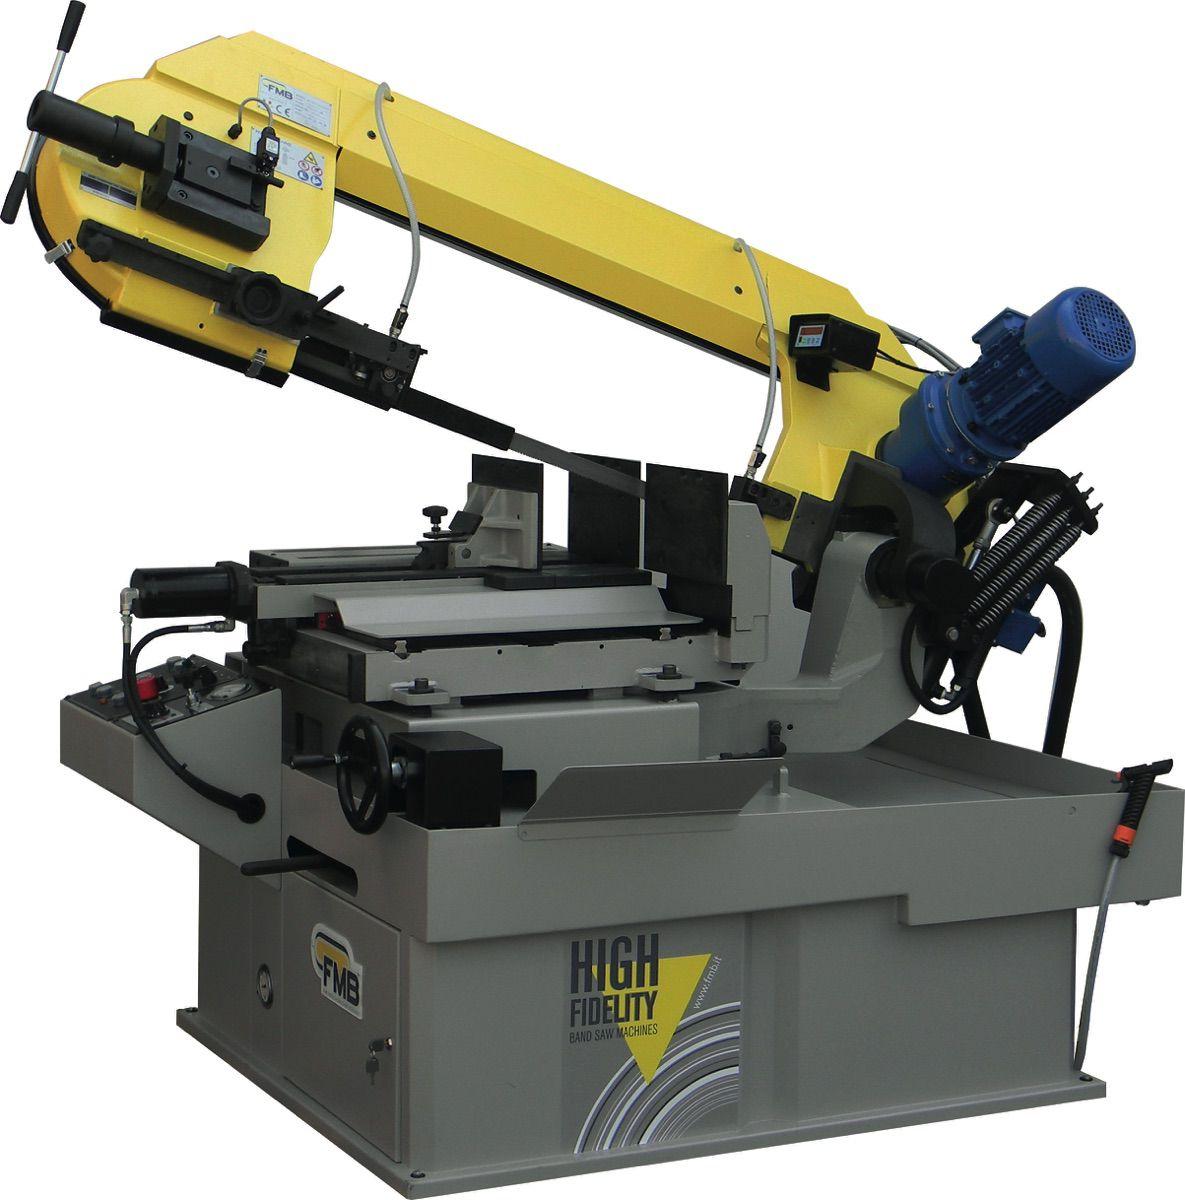 fmb pegasus dsvhz halfautomatische lintzaagmachine